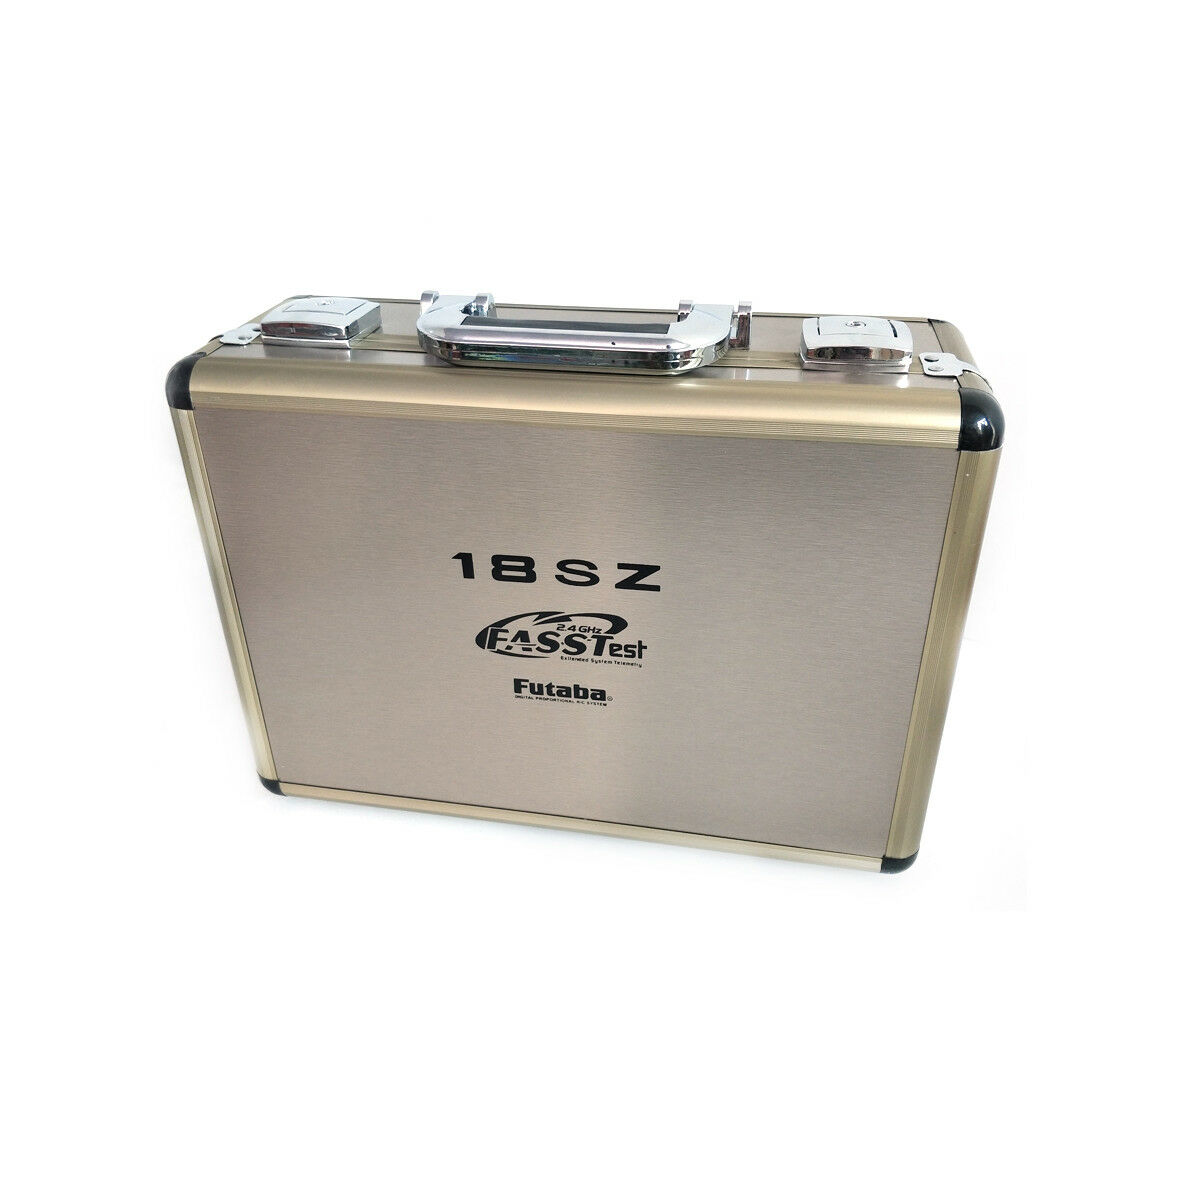 Advanced RC Drone Carry Hard Aluminum Case For Futaba 18MZ 18SZ 14SG 10C 8FG 8J